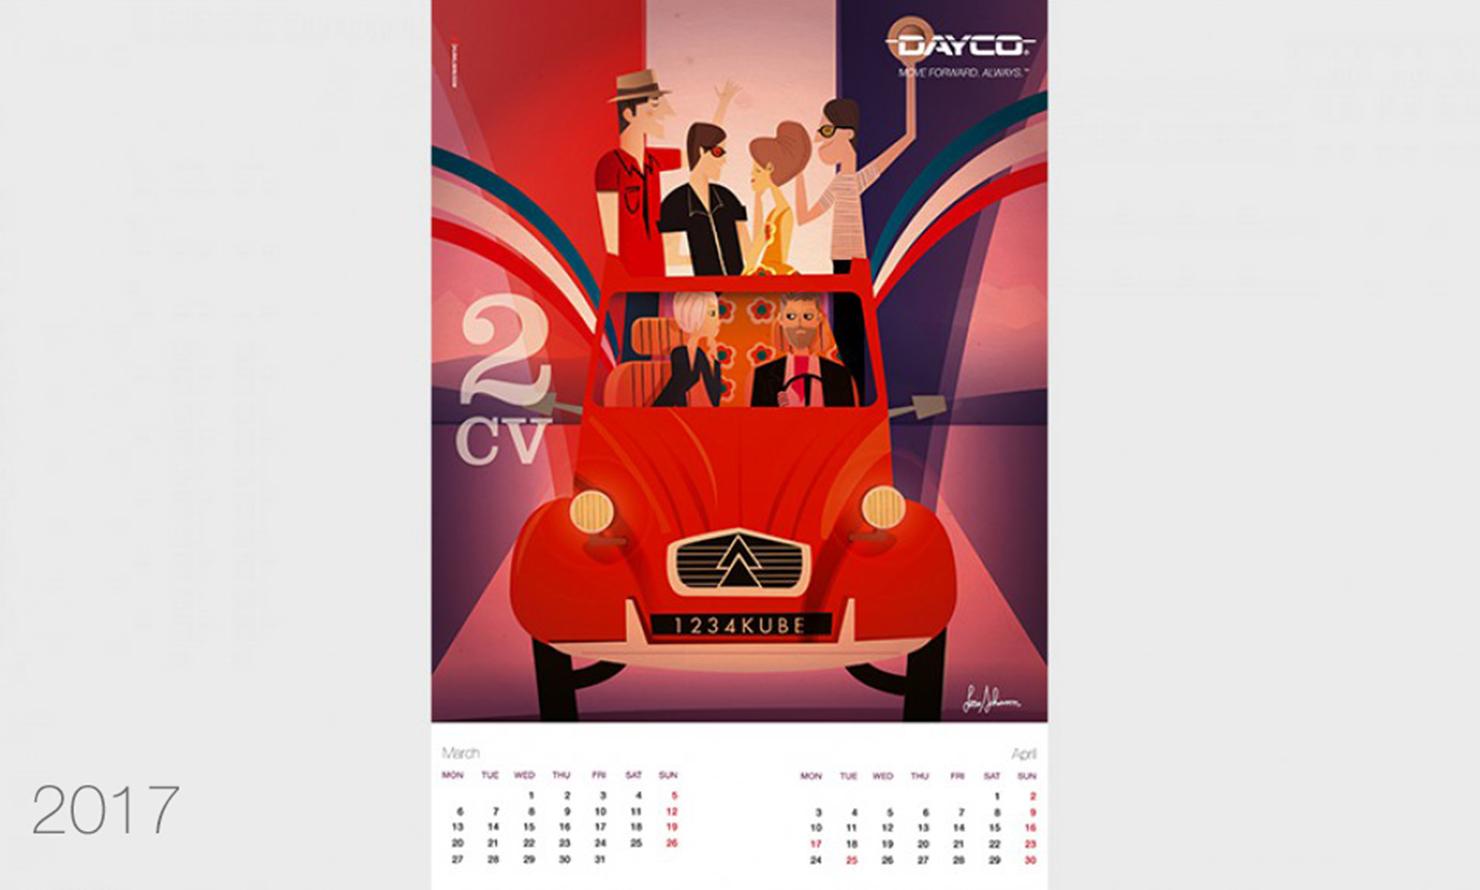 https://www.kubelibre.com/uploads/Slider-work-tutti-clienti/dayco-calendario-2017-2.jpg